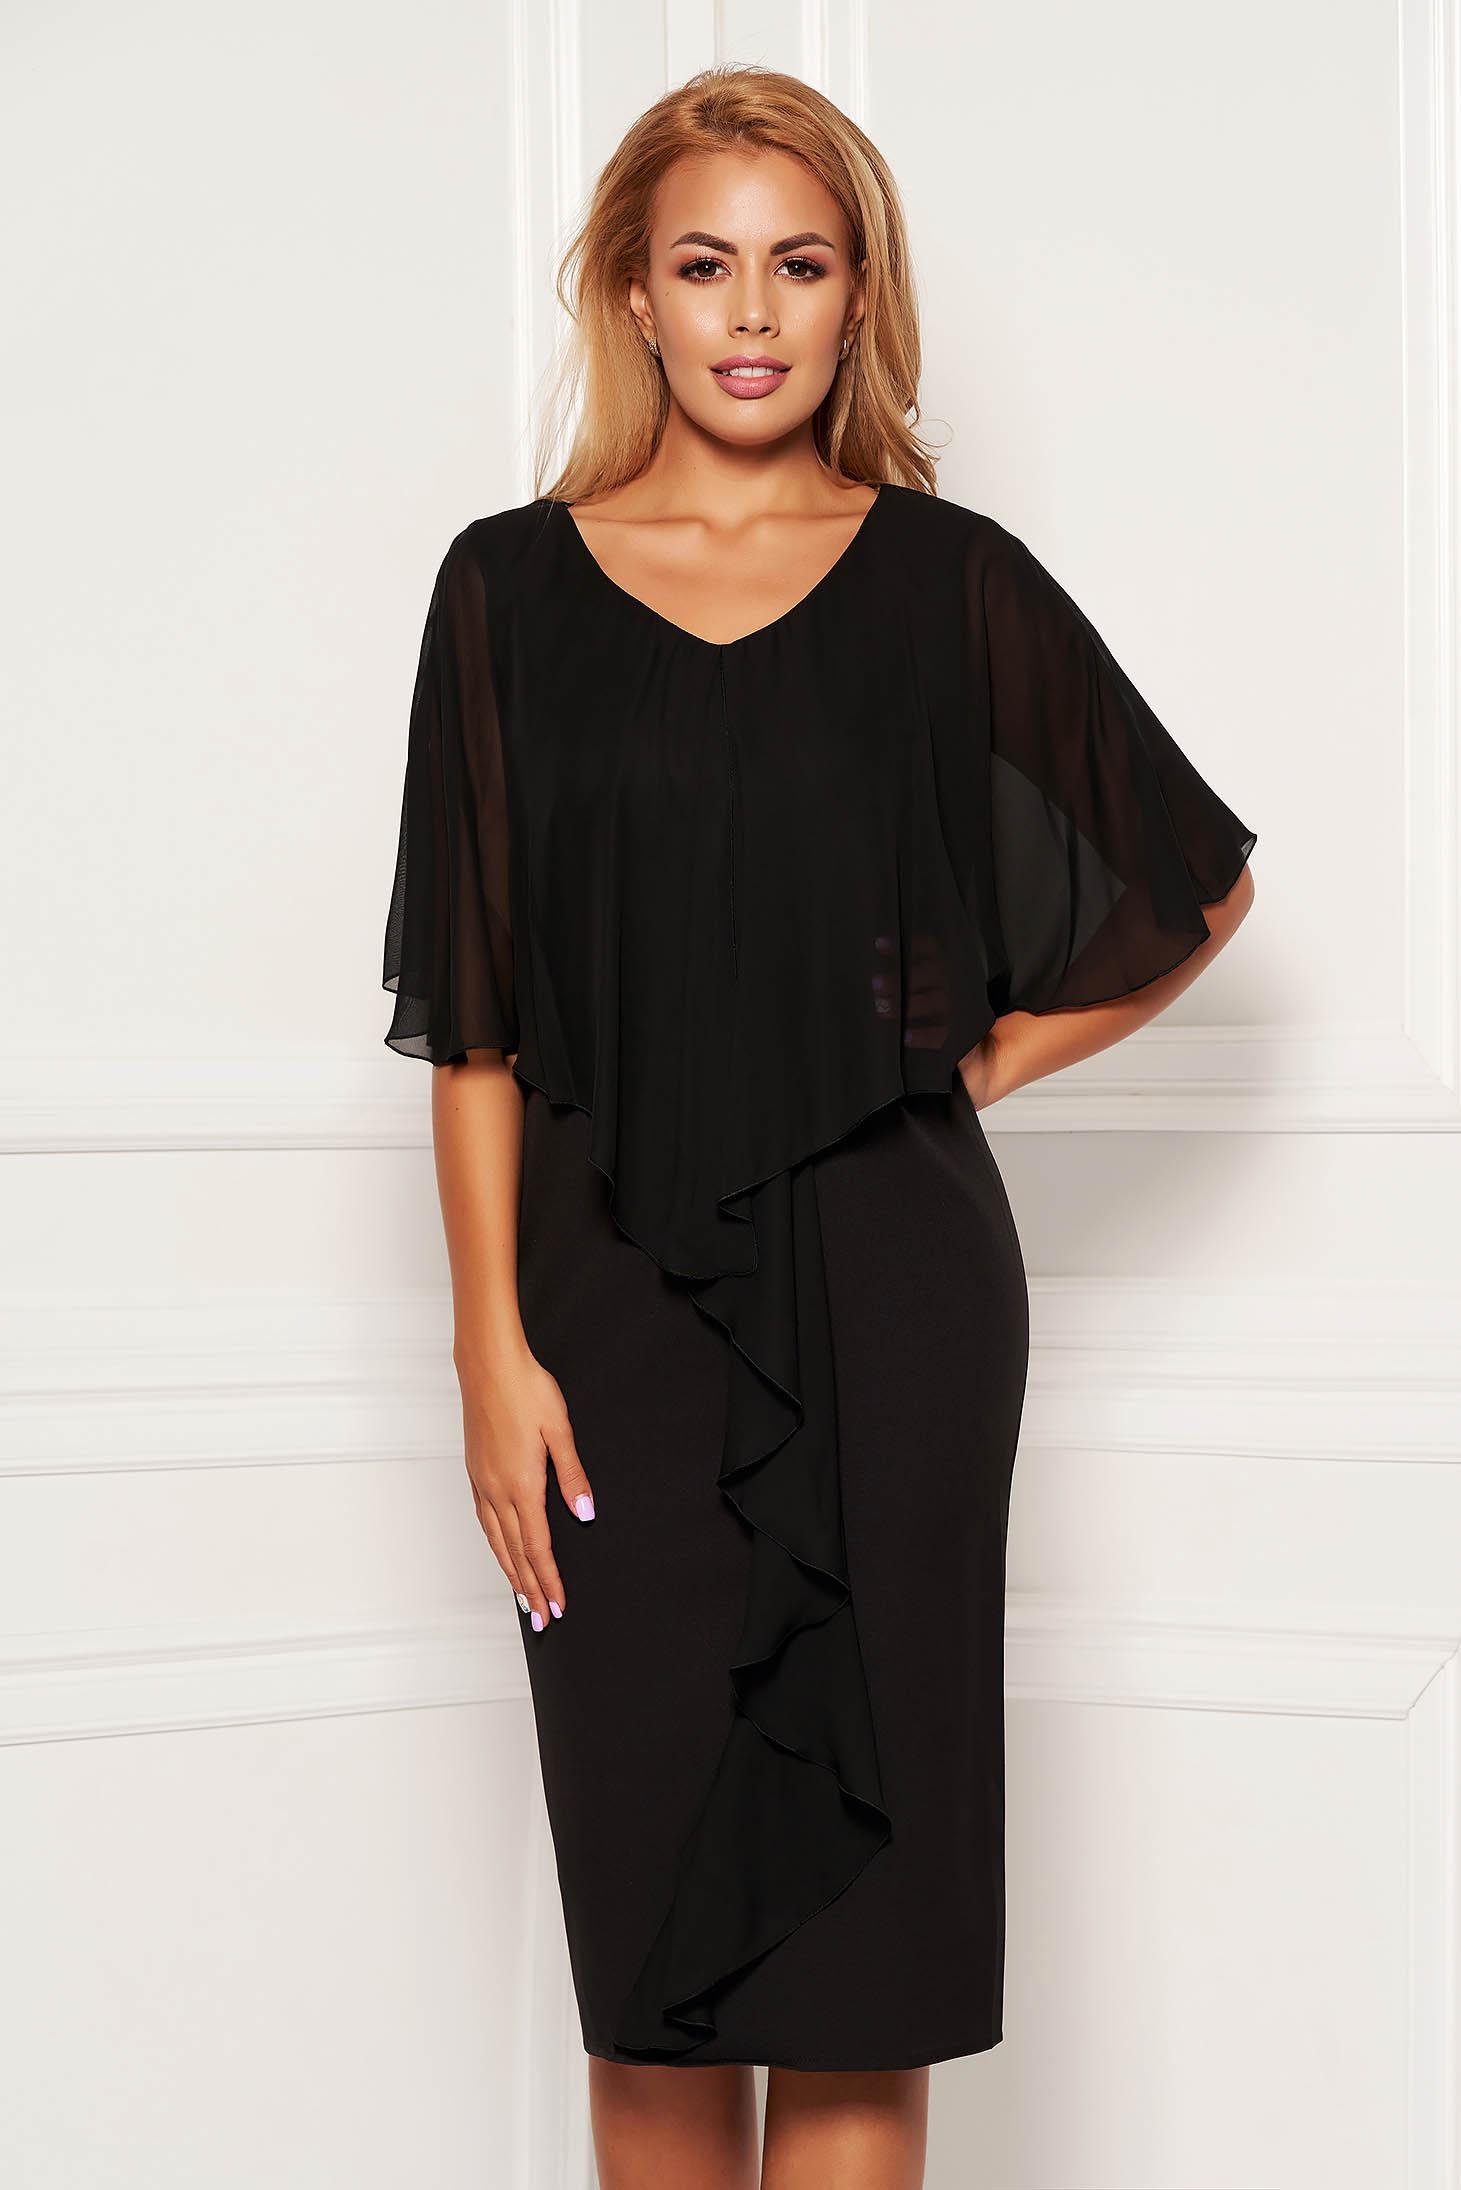 Rochie neagra midi de ocazie fara maneci cu un croi cambrat din stofa subtire usor elastica si suprapunere cu voal